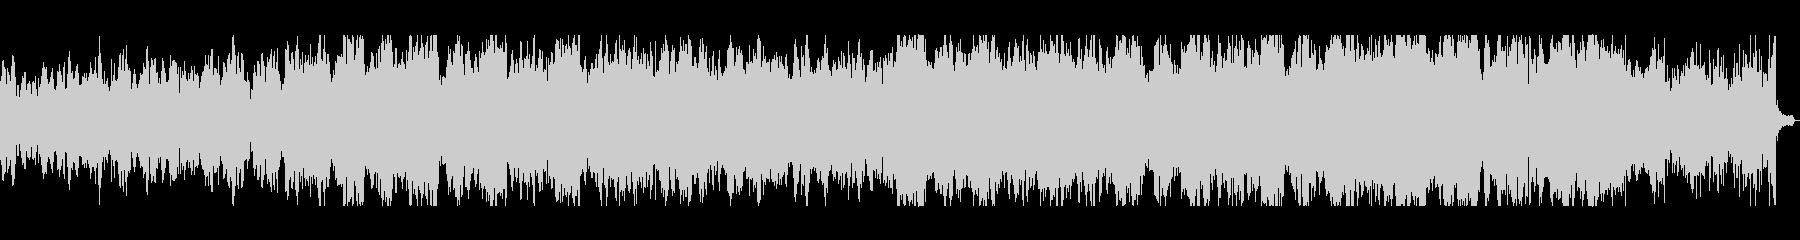 KANT無機質ホラーBGMの未再生の波形